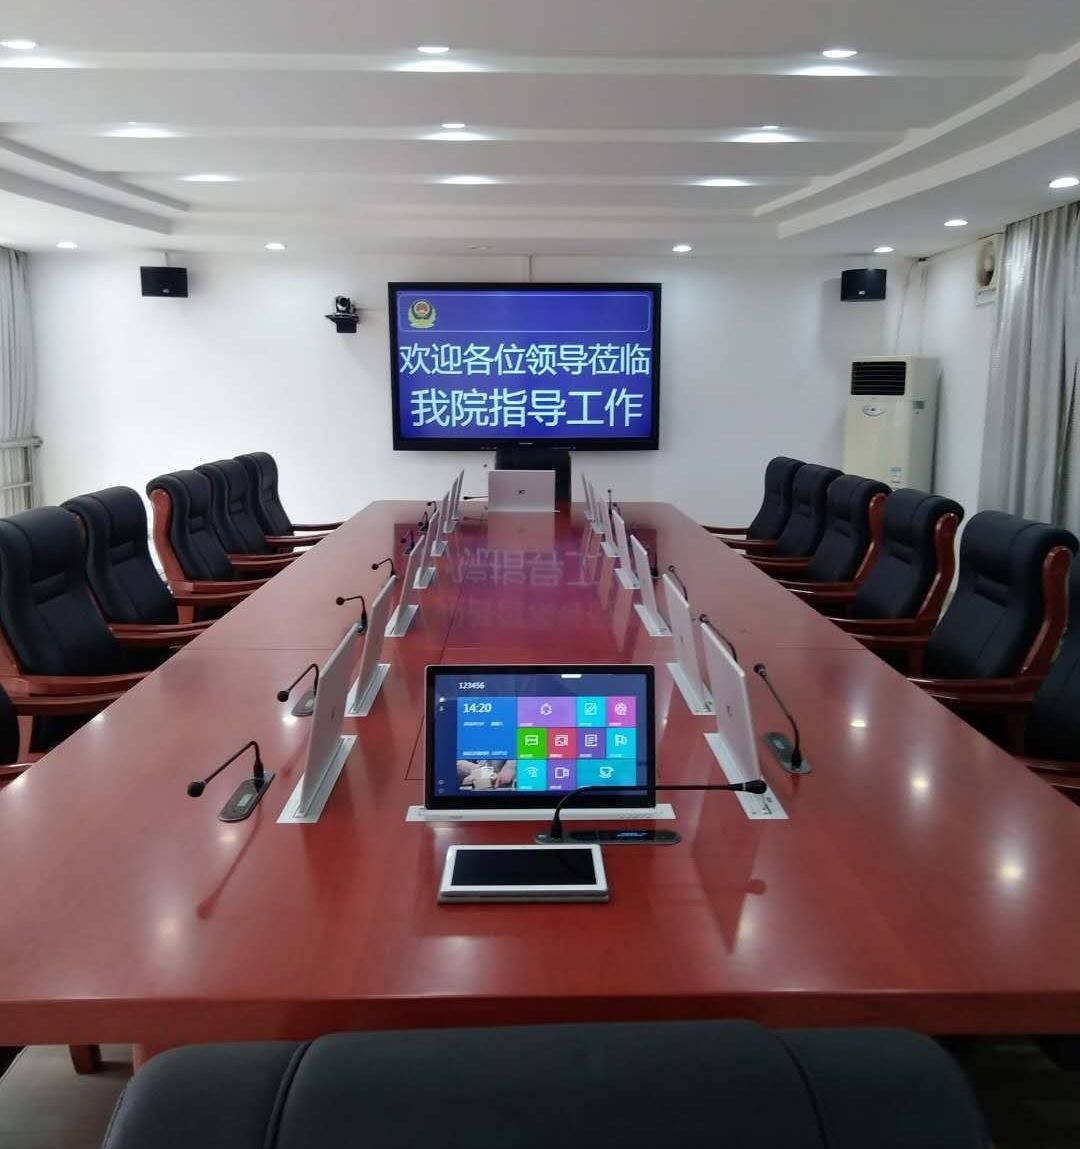 itc无纸化会议系统成功应用于韶关某检察院.docx